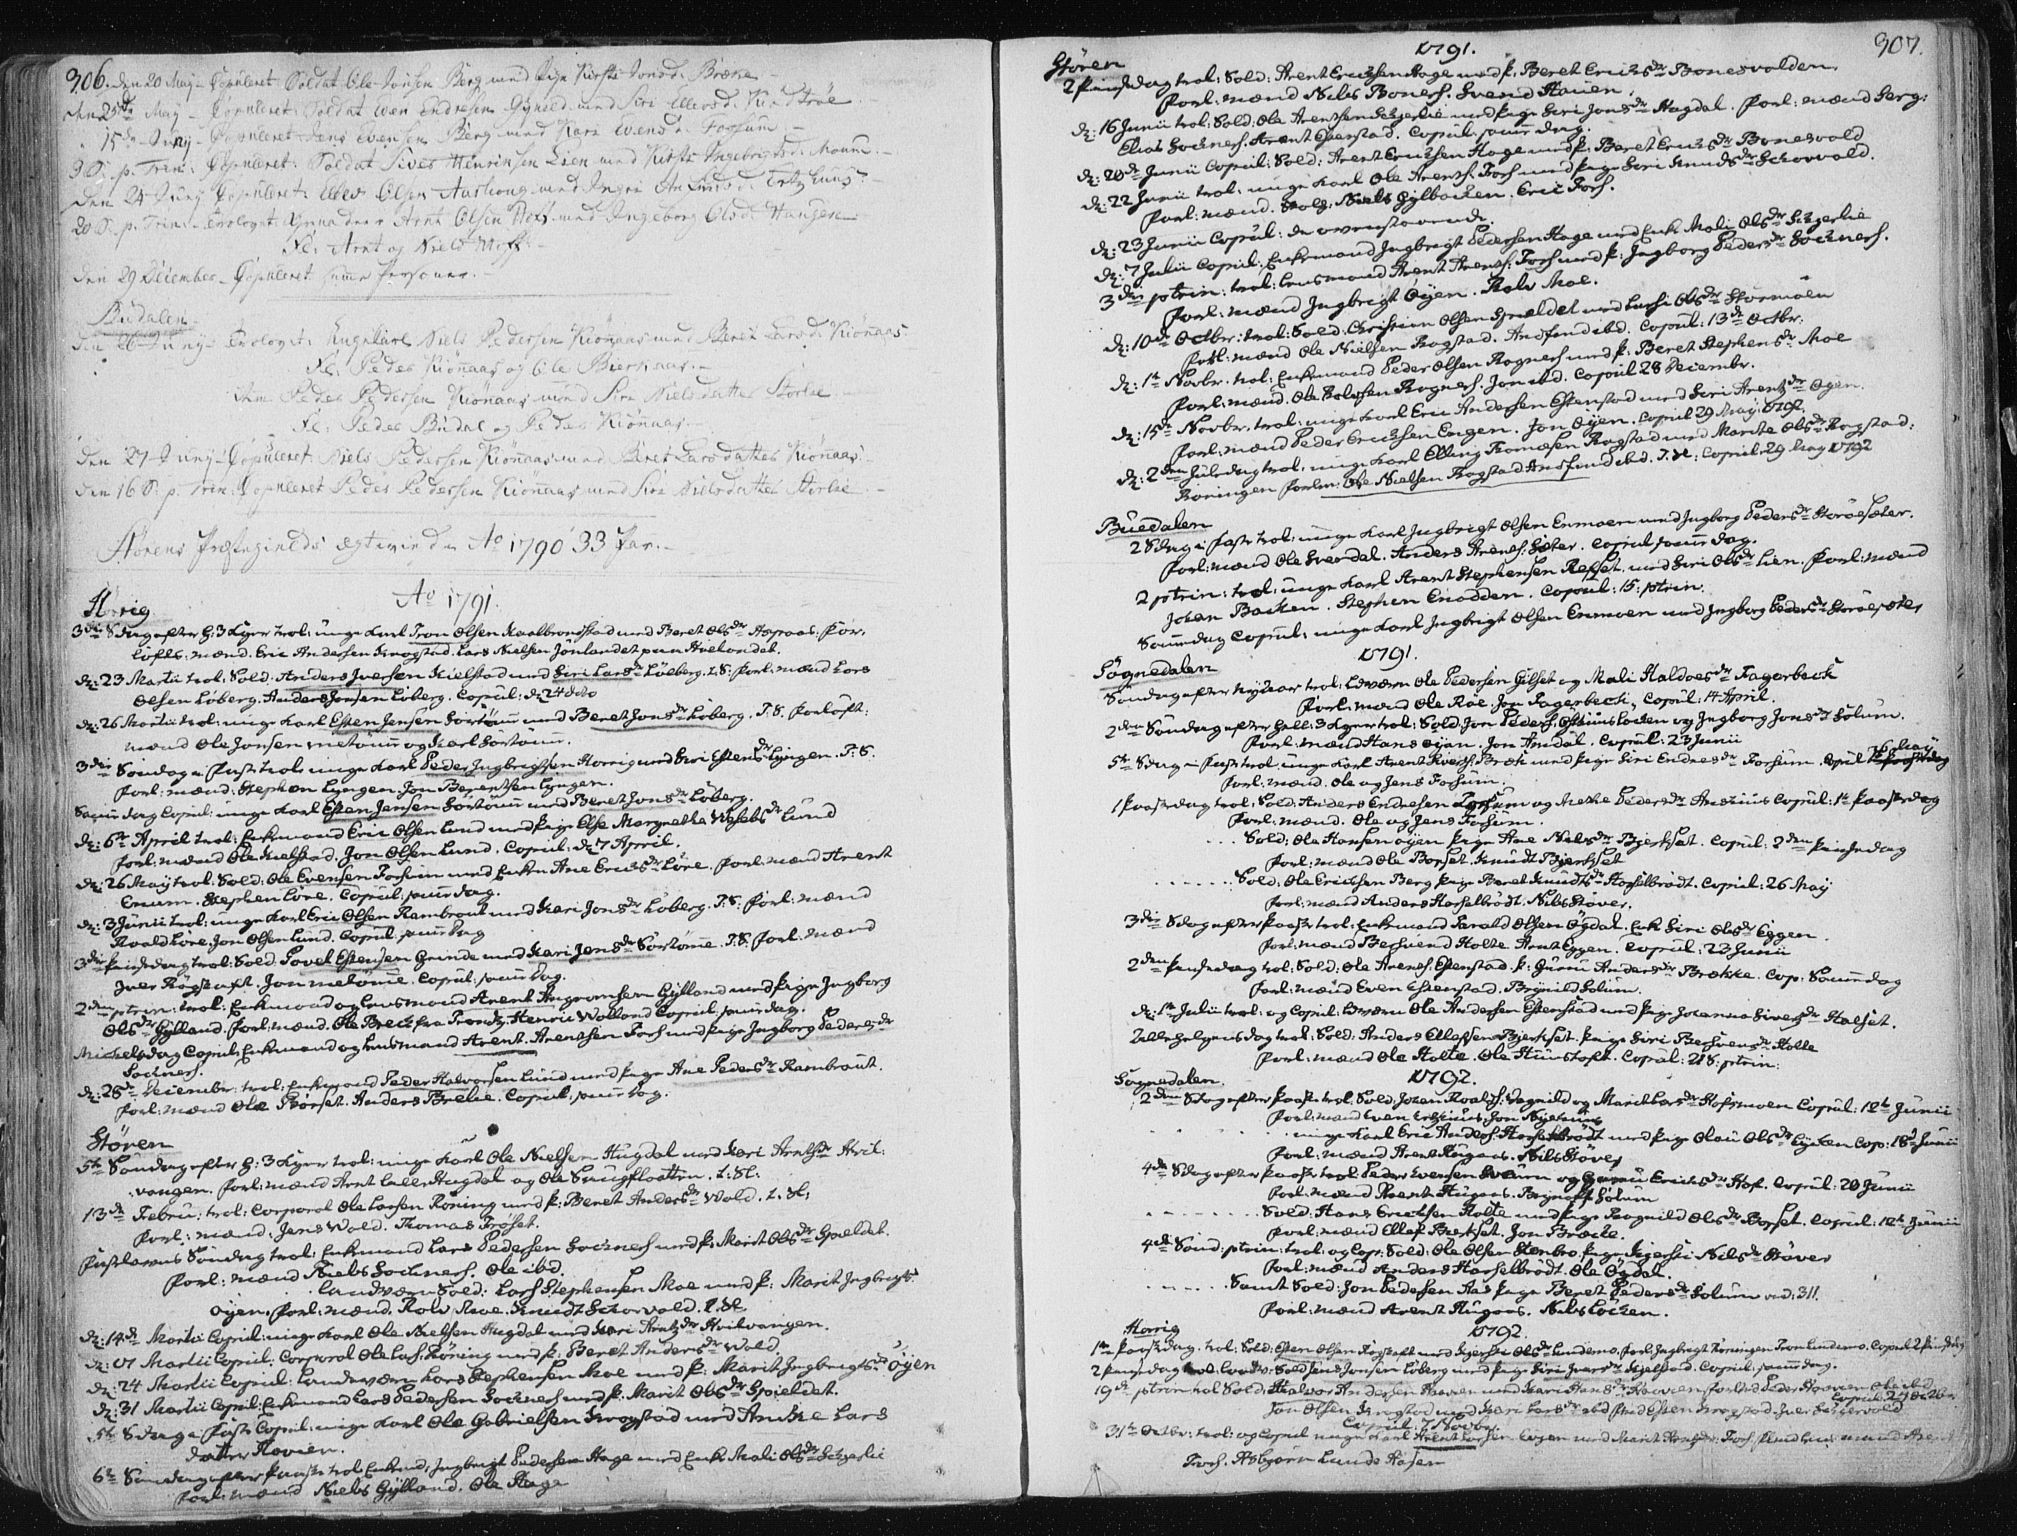 SAT, Ministerialprotokoller, klokkerbøker og fødselsregistre - Sør-Trøndelag, 687/L0992: Parish register (official) no. 687A03 /1, 1788-1815, p. 306-307